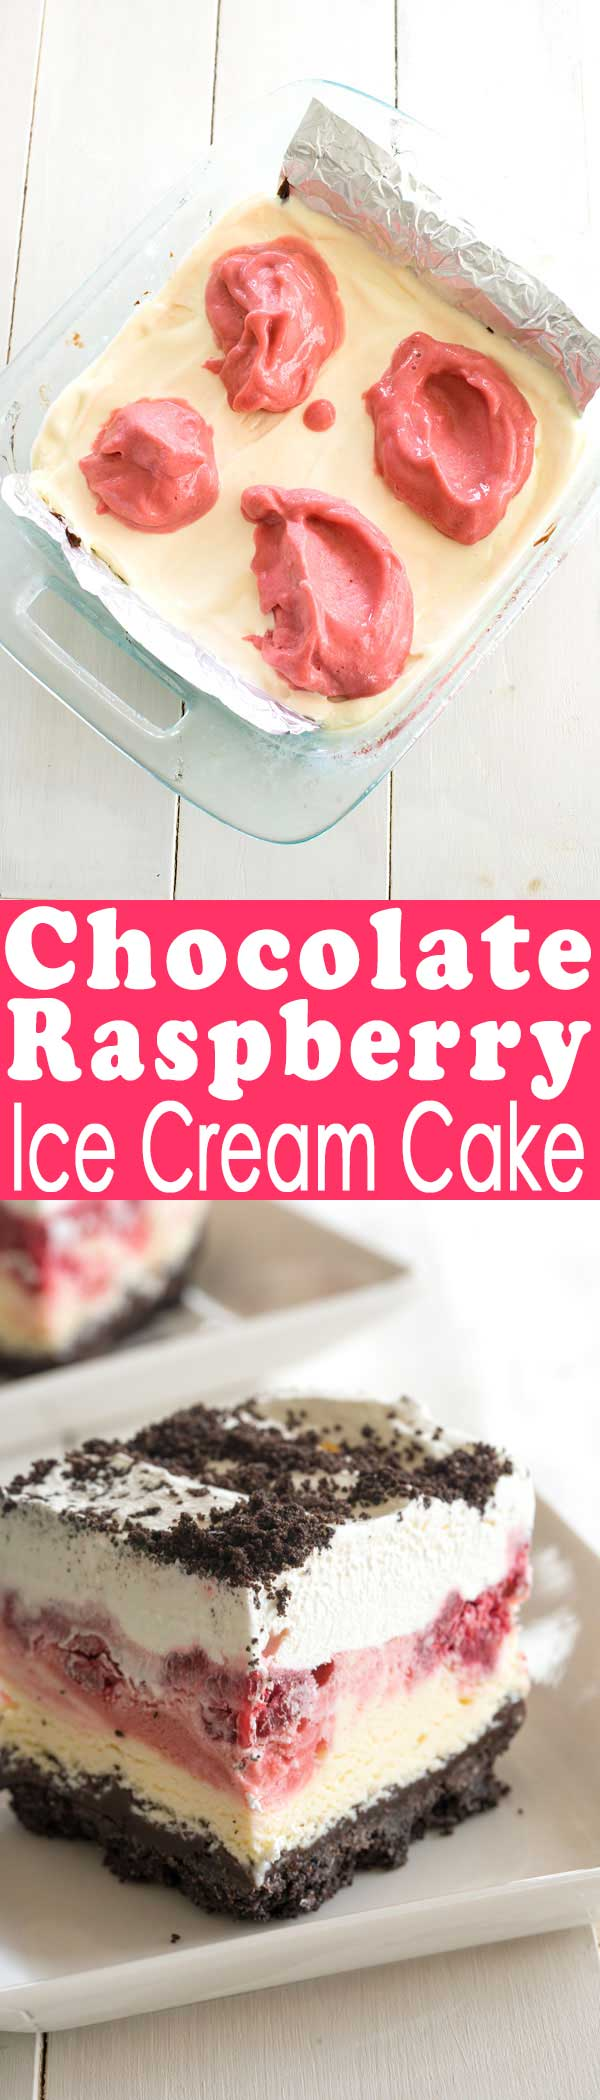 No bake frozen chocolate Raspberry Dessert with Oreo cookie crust. Looks so fancy but easy to make! #dessert #nobake #icecream #dessertrecipes #foodgawker #oreo #cake